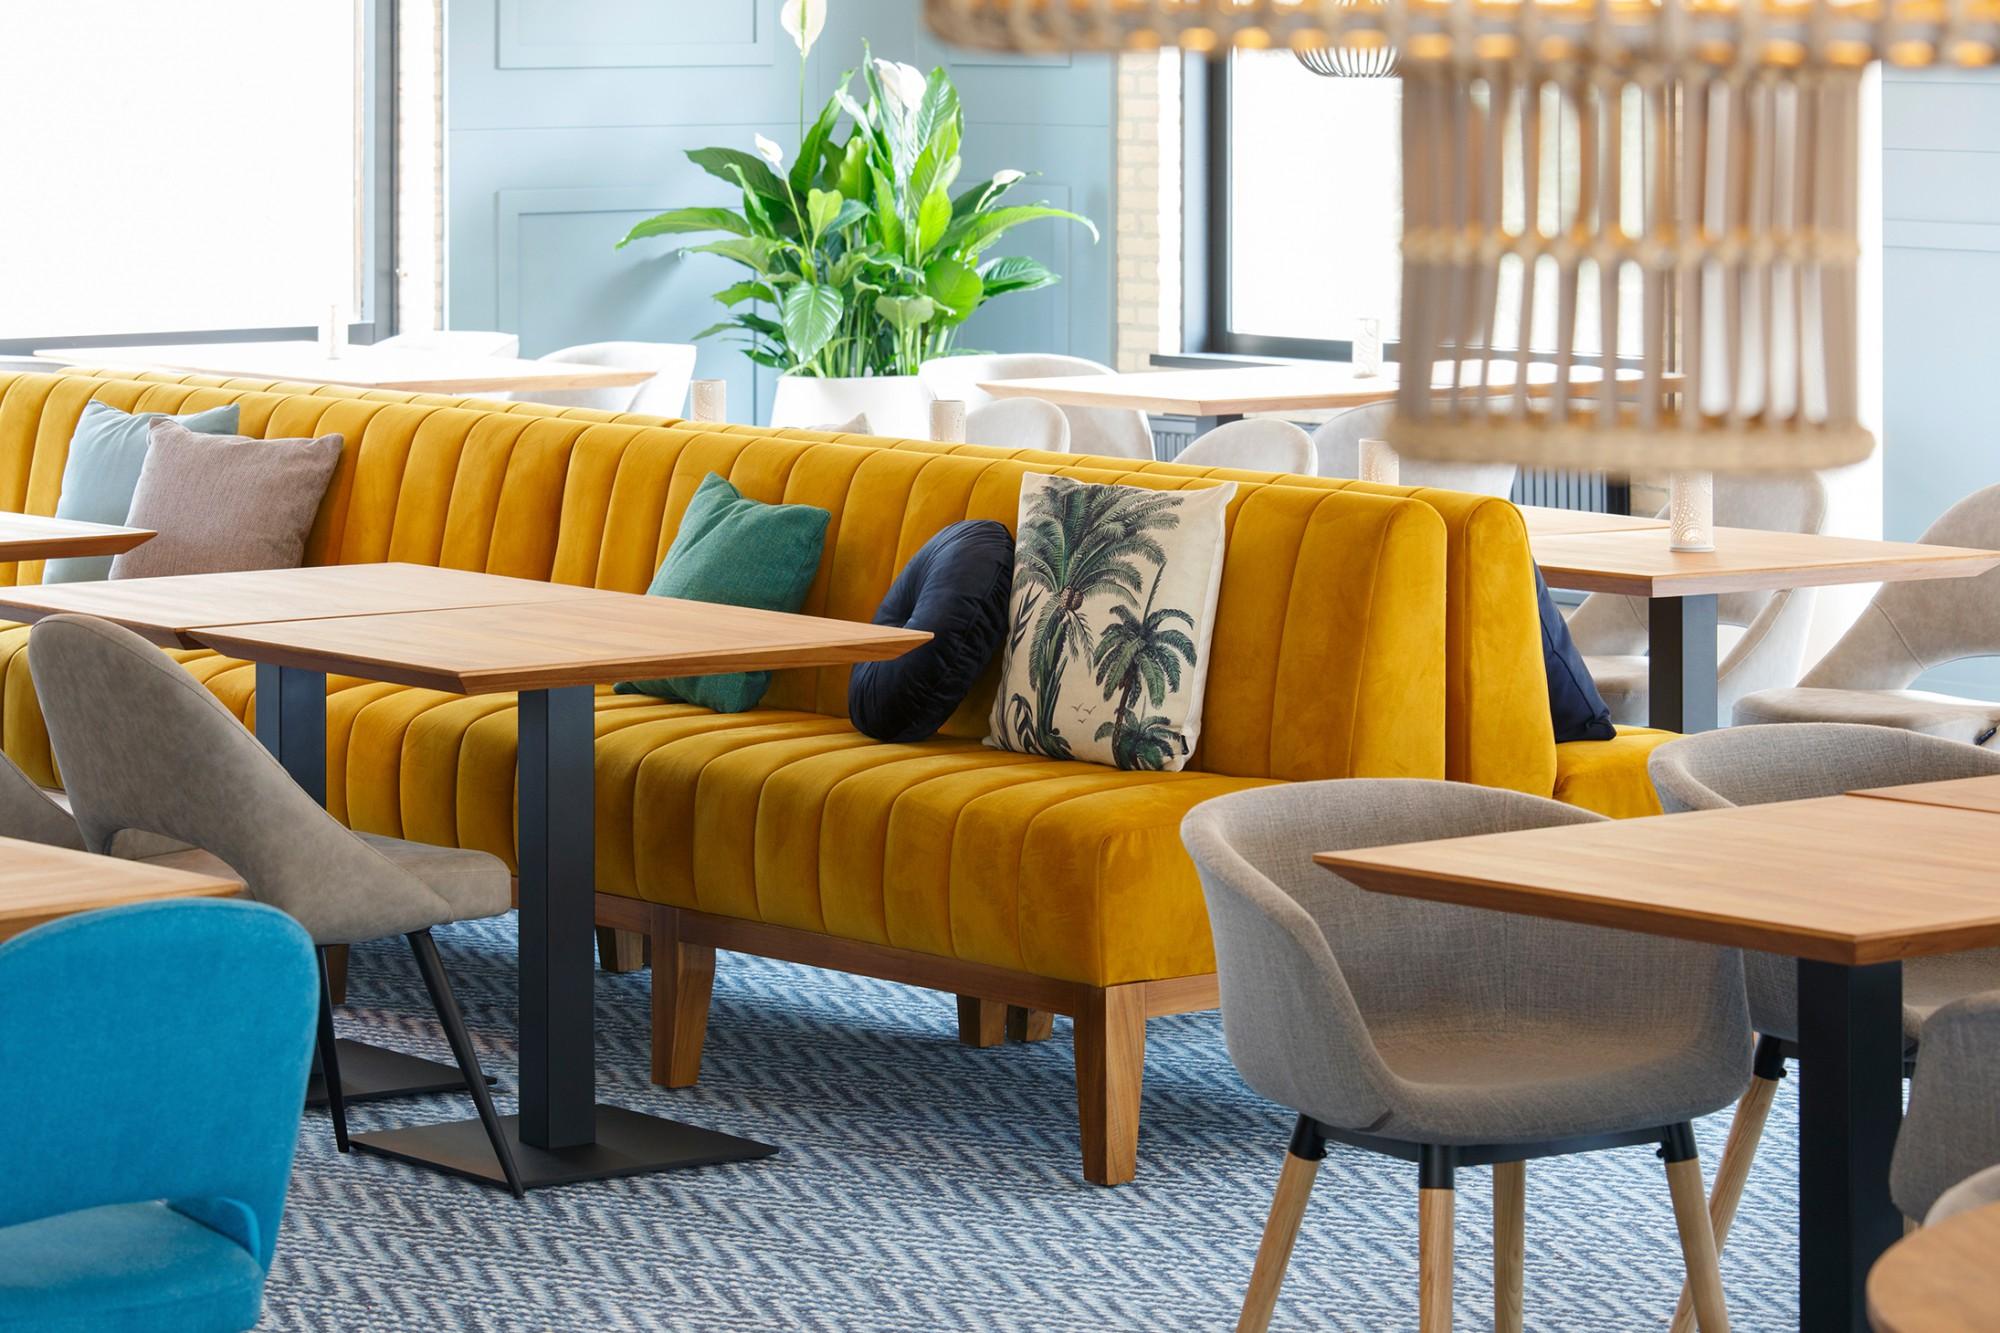 https://www.otdesign.com/wp-content/uploads/2020/11/OTdesign_Restaurant_De_Boschrand_2_3183_otdesign_retklotti.jpg